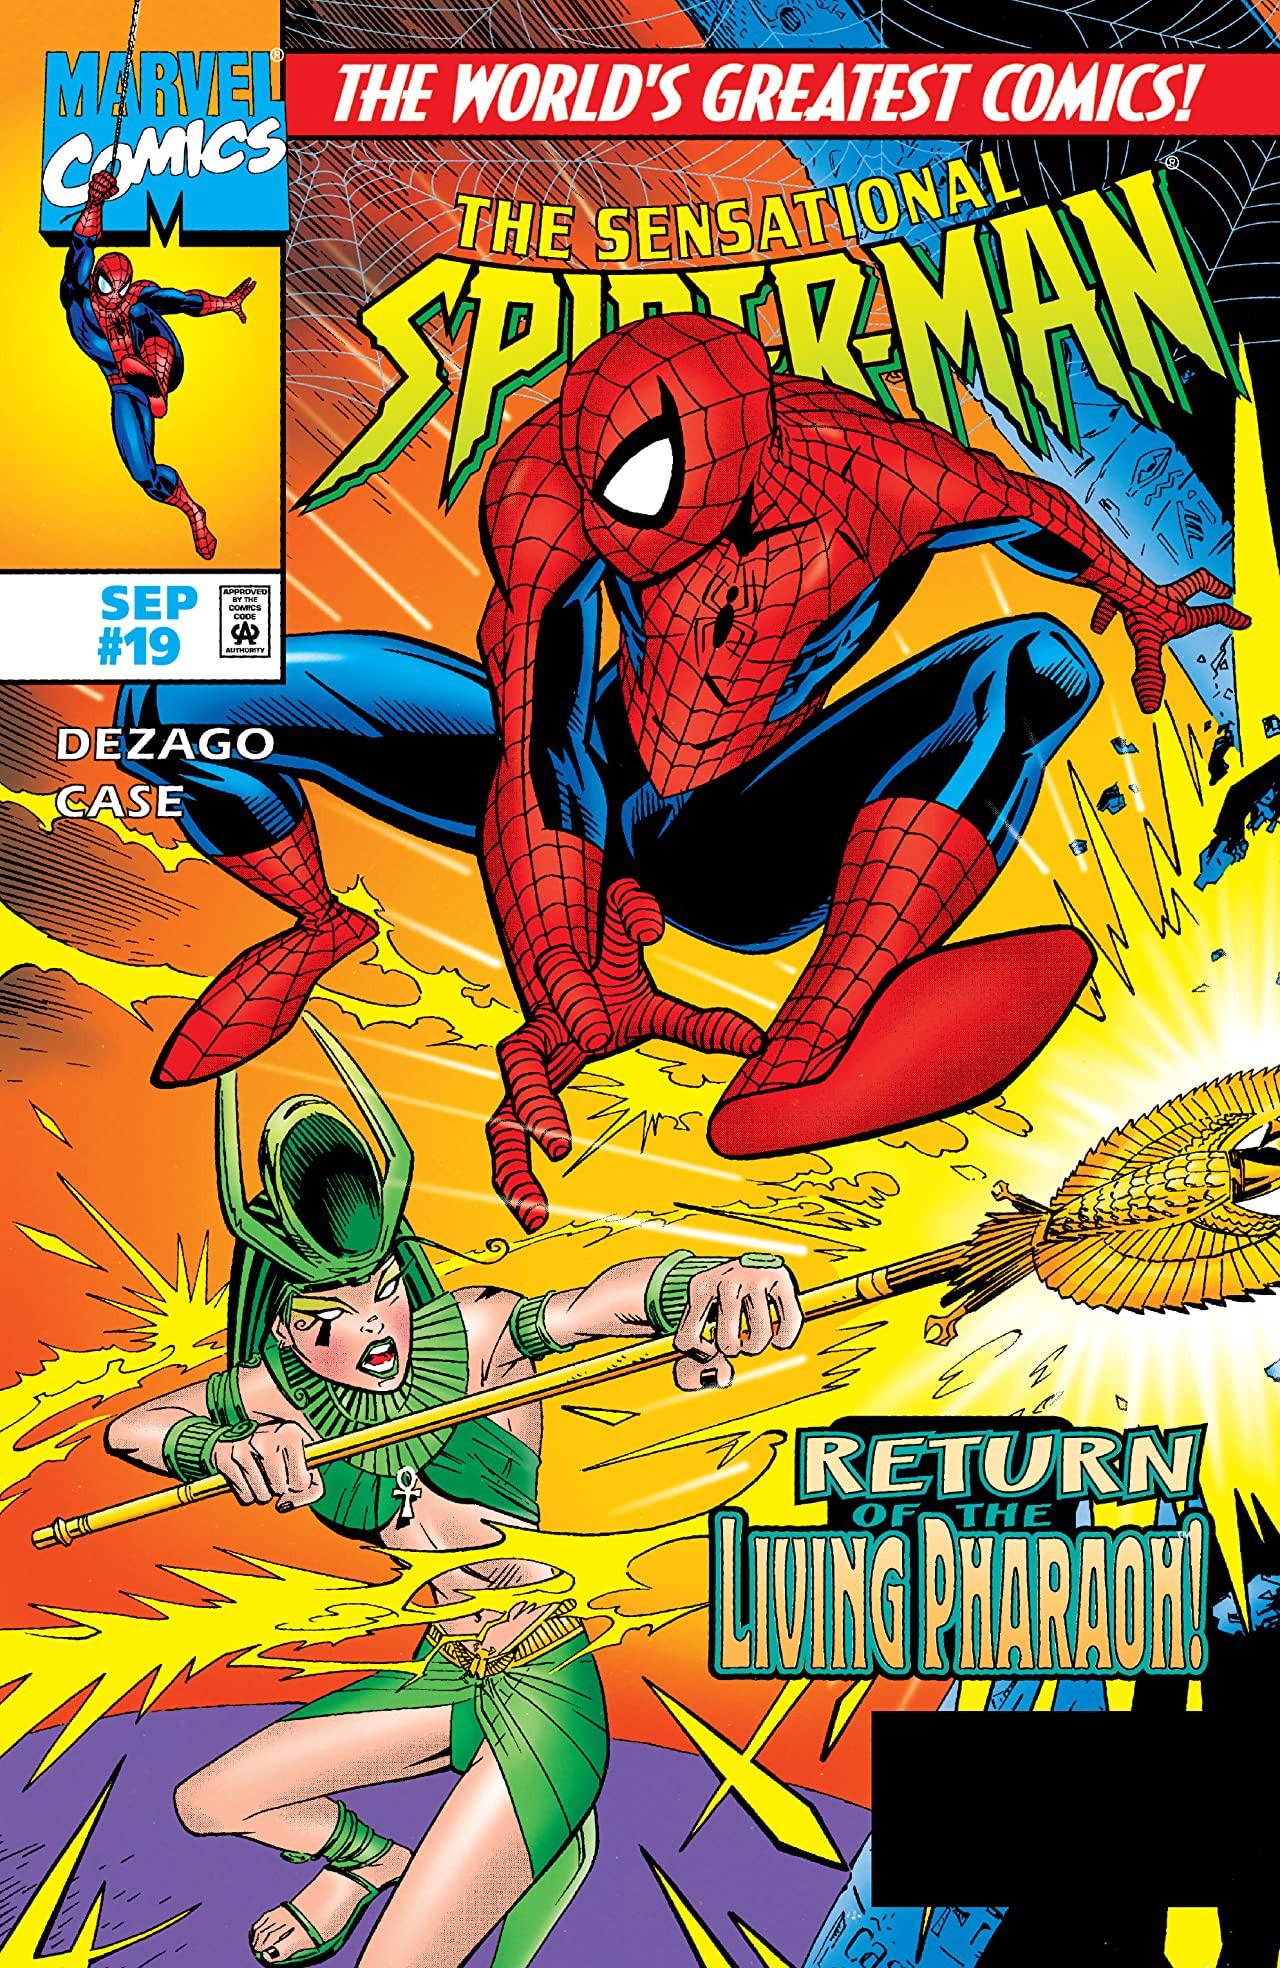 Sensational Spider-Man Vol 1 19